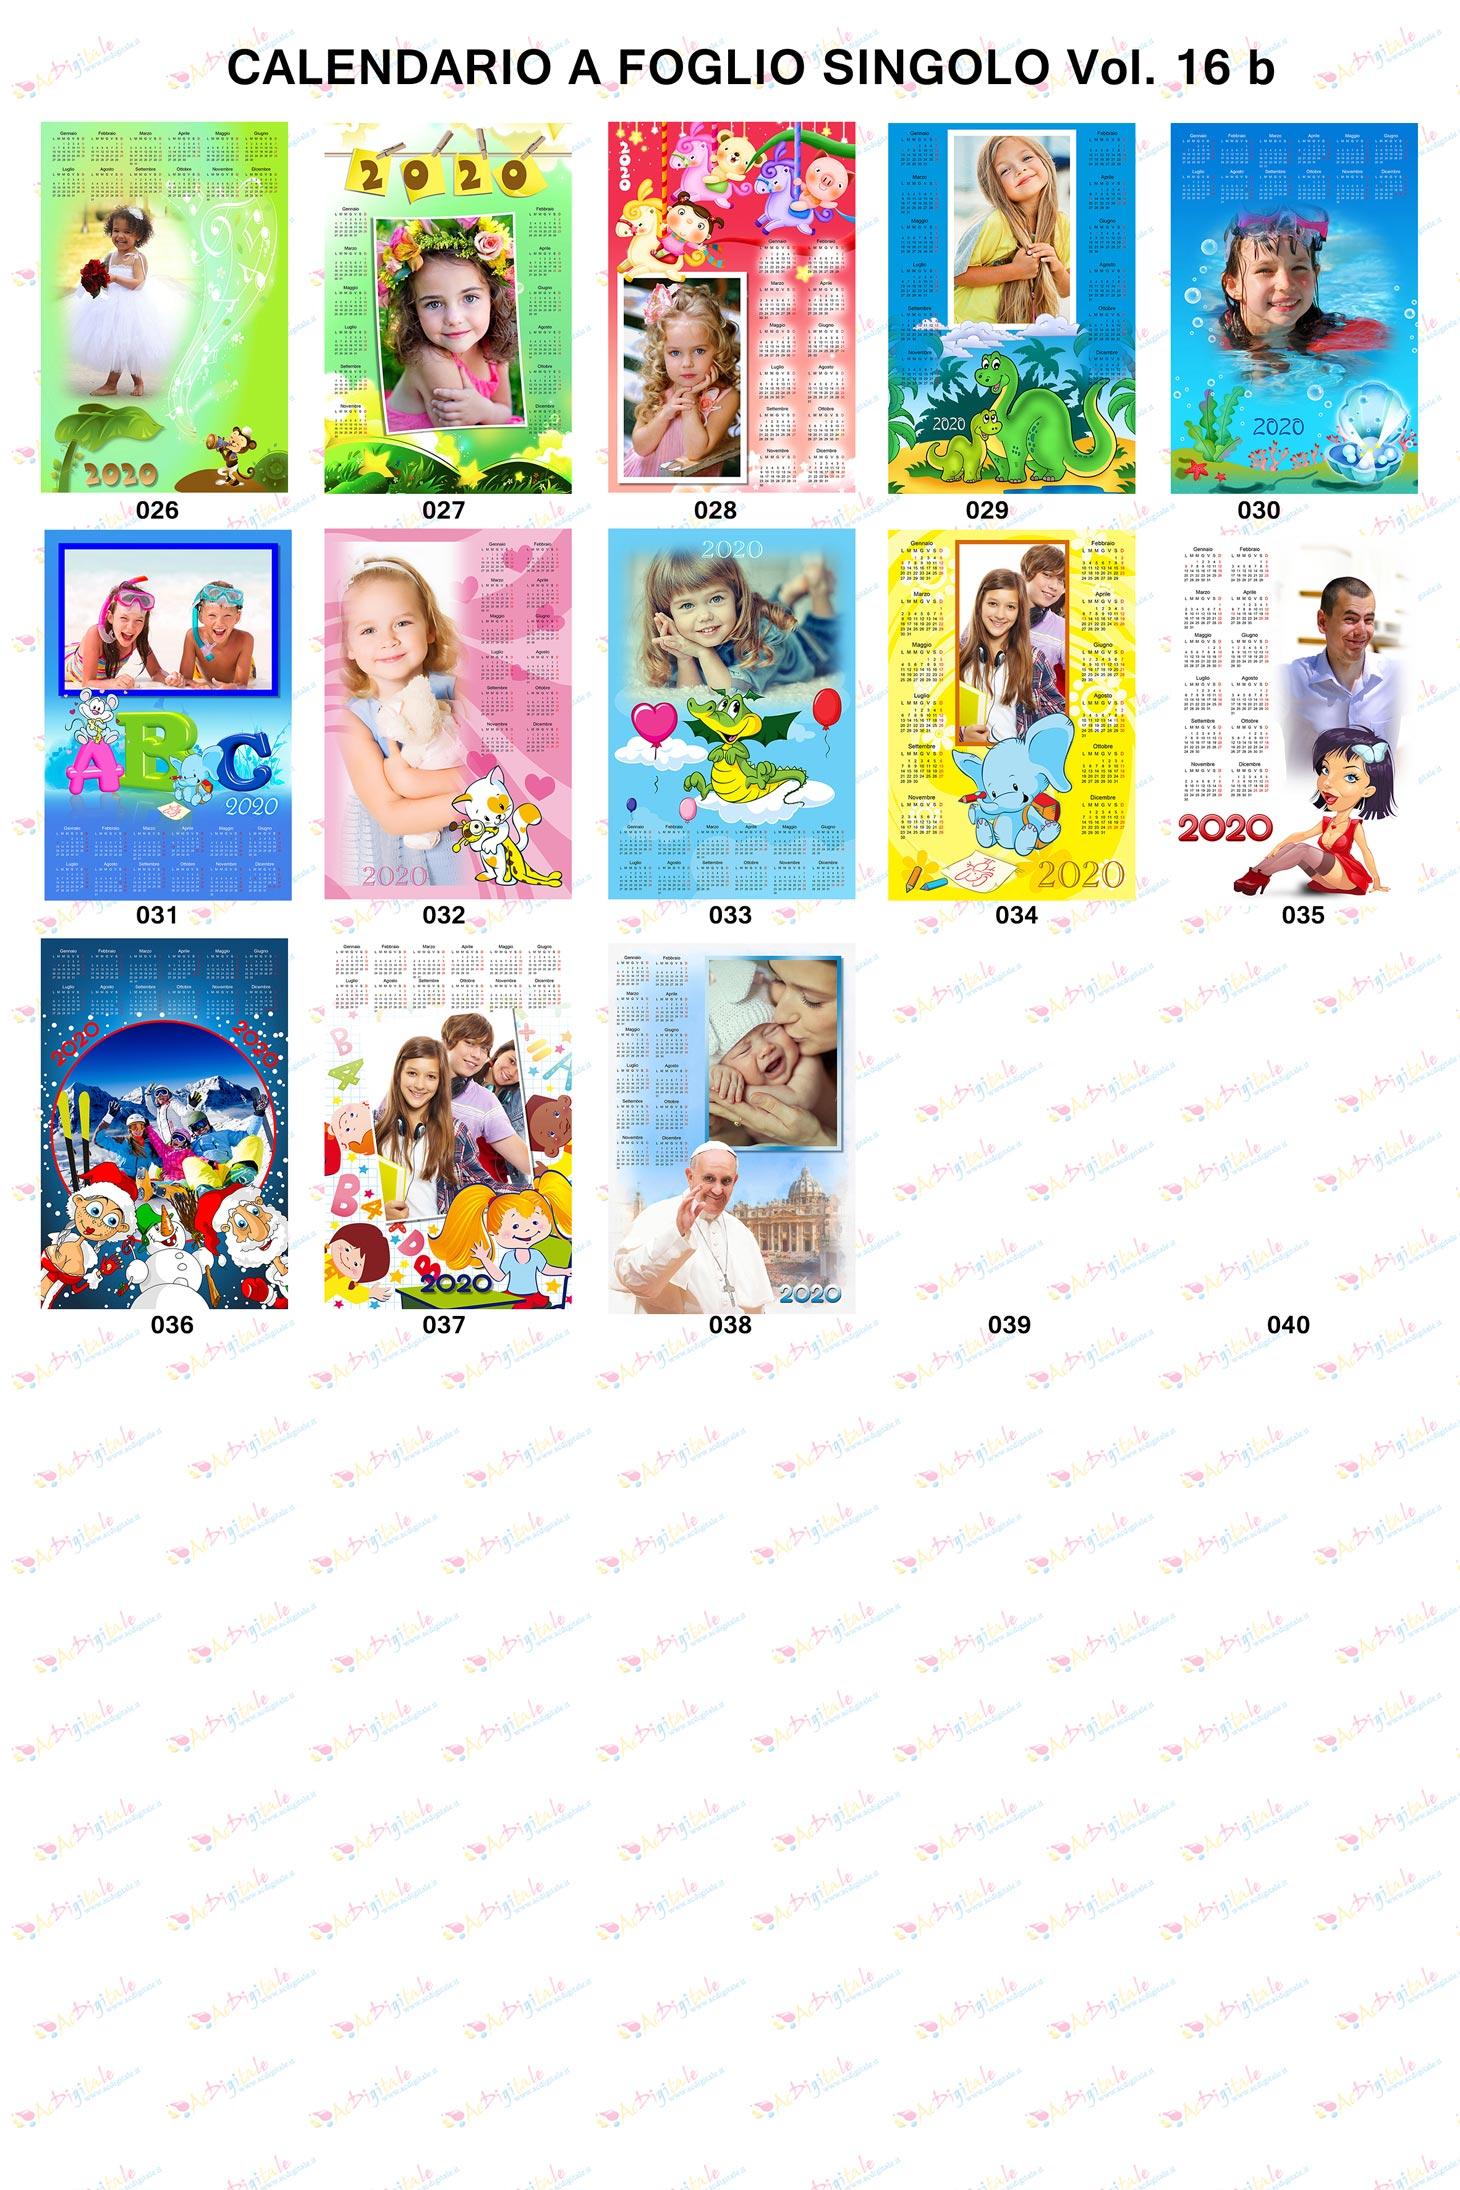 Anteprima calendari personalizzati 2020 volume 16b